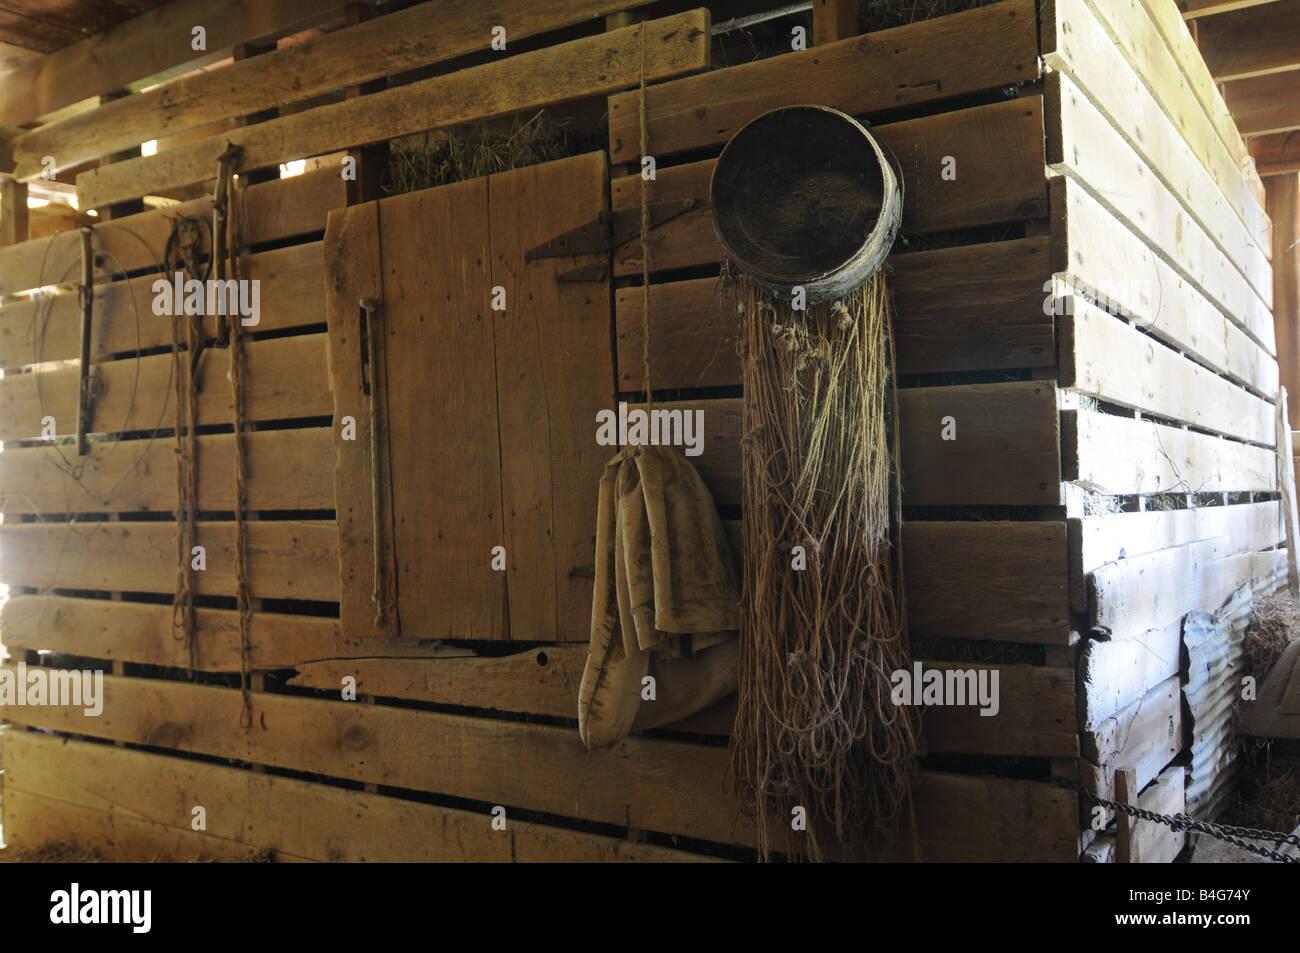 Wooden crib for sale in cebu - 1800s Corn Crib In Wooden Barn Illinois Inside Us Stock Image